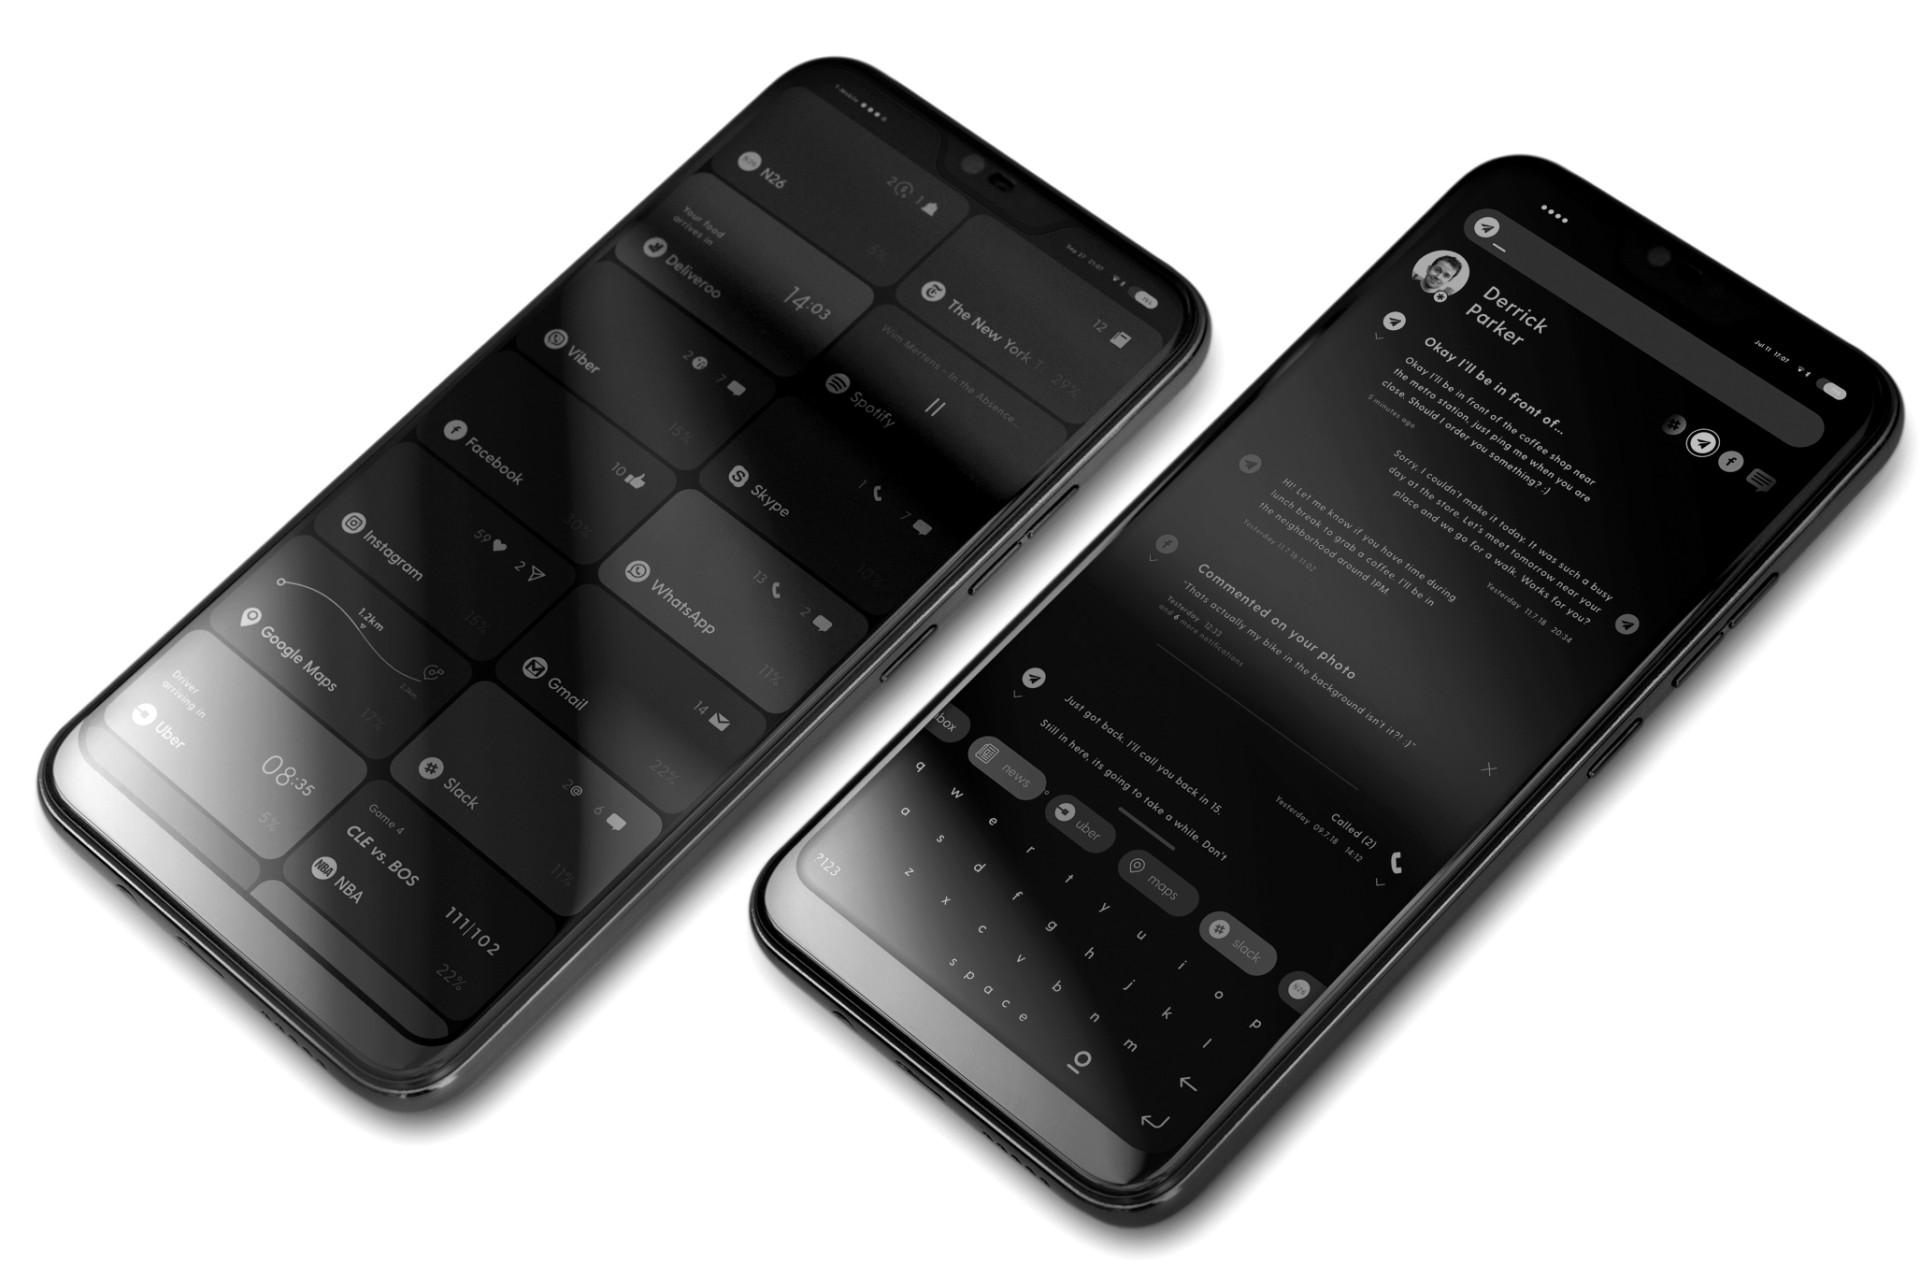 Two images of the Blloc Zero 18 smartphone.